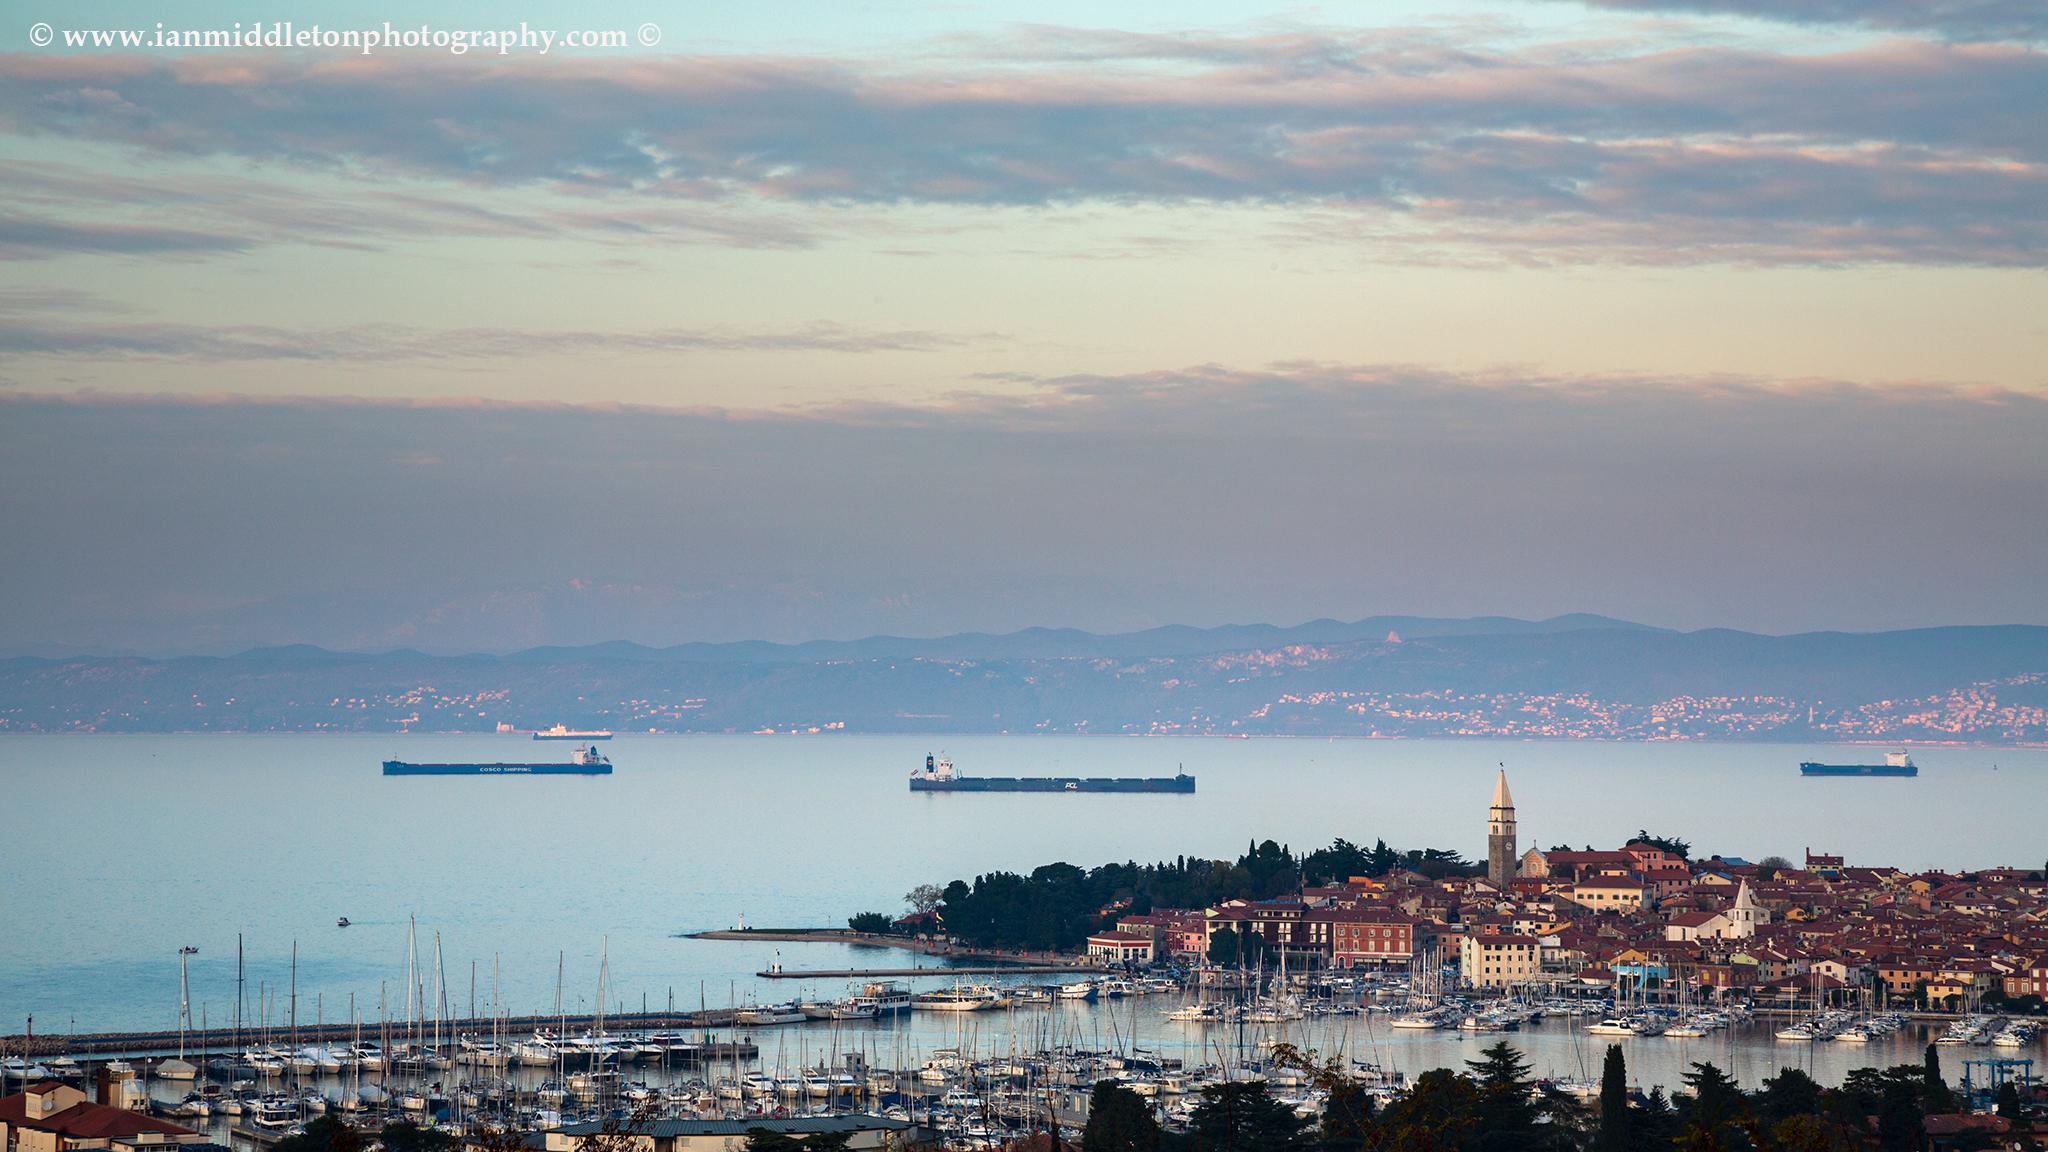 Sun setting over Izola harbour, Slovenia